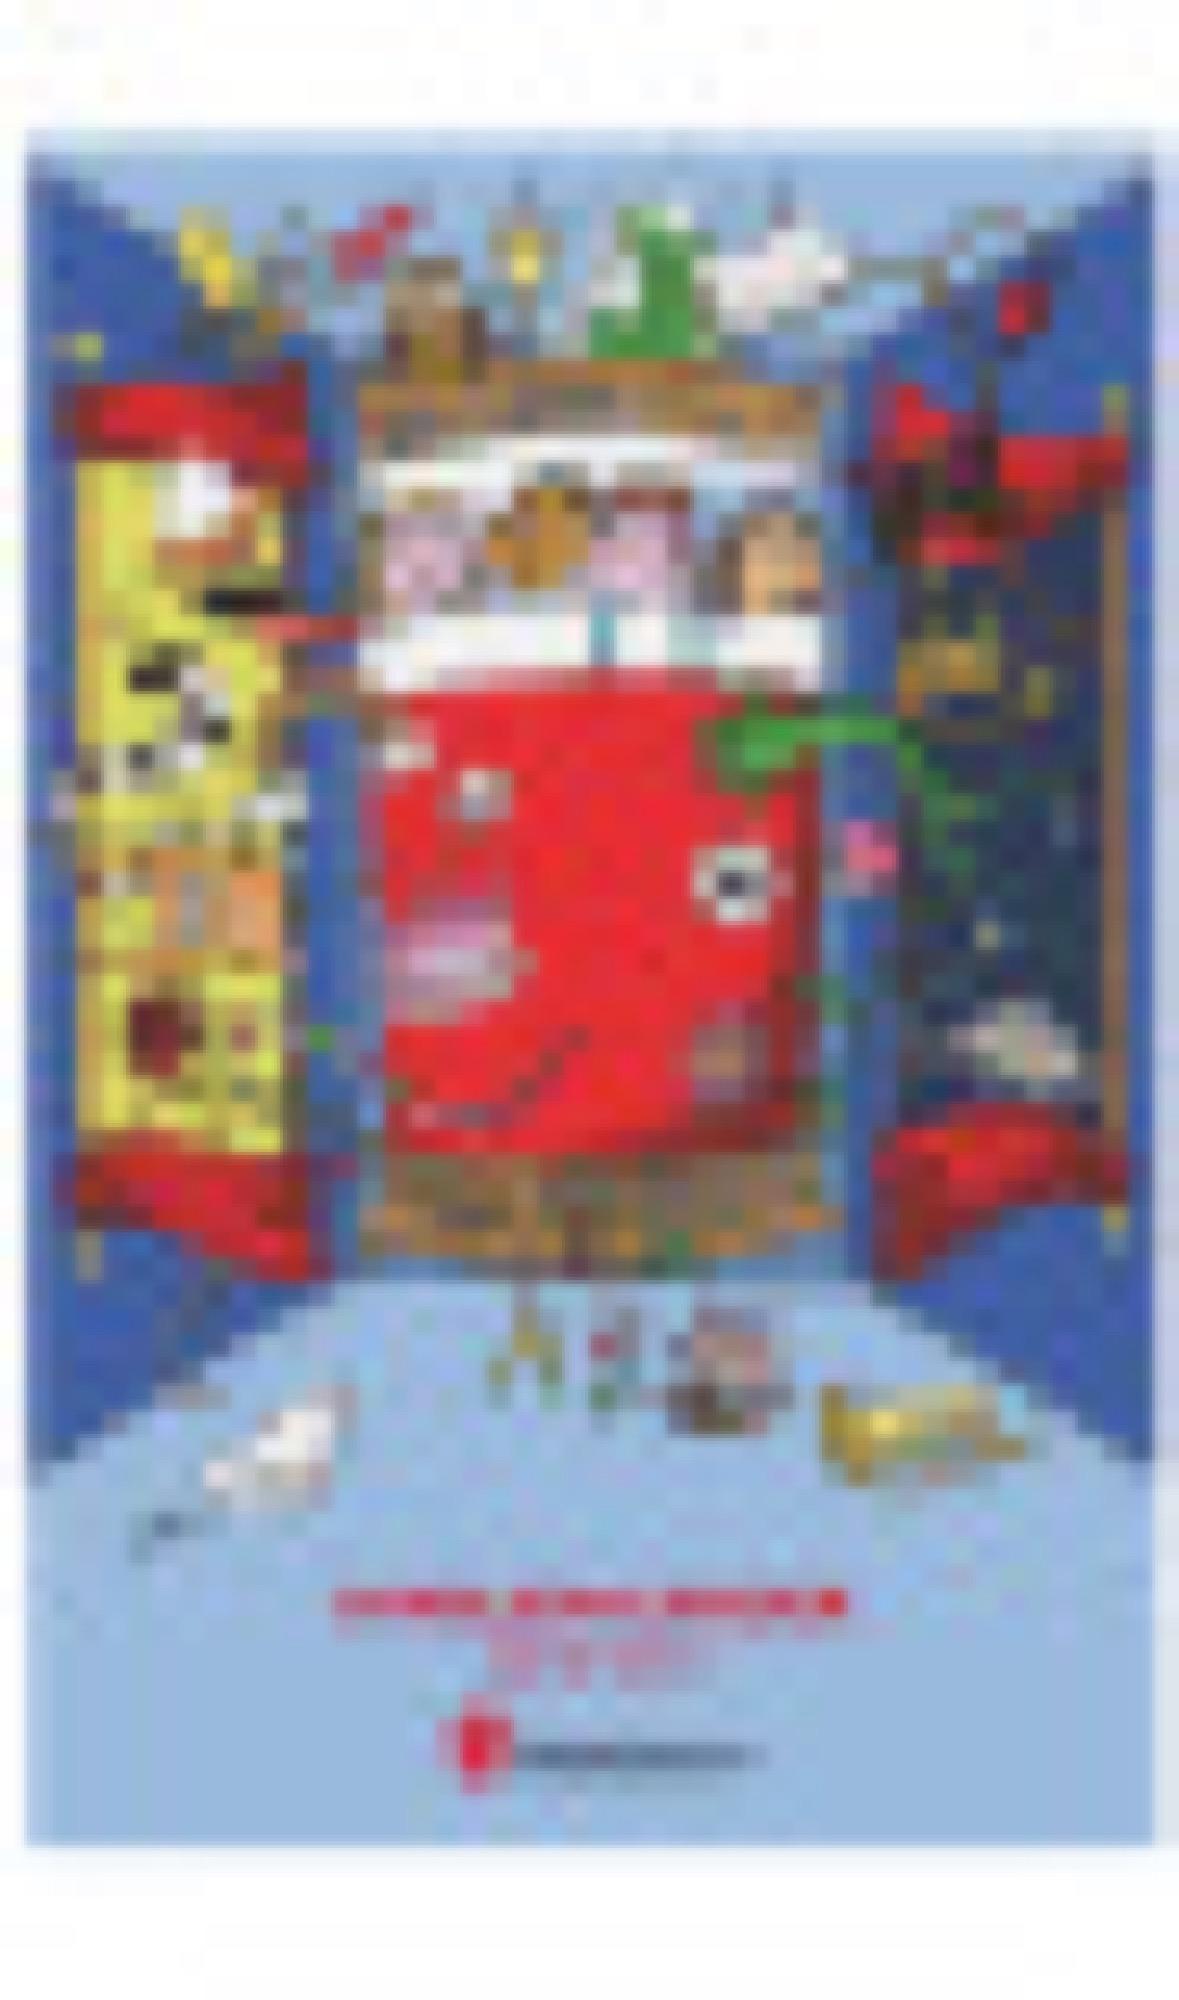 Familjekalender 2010/11